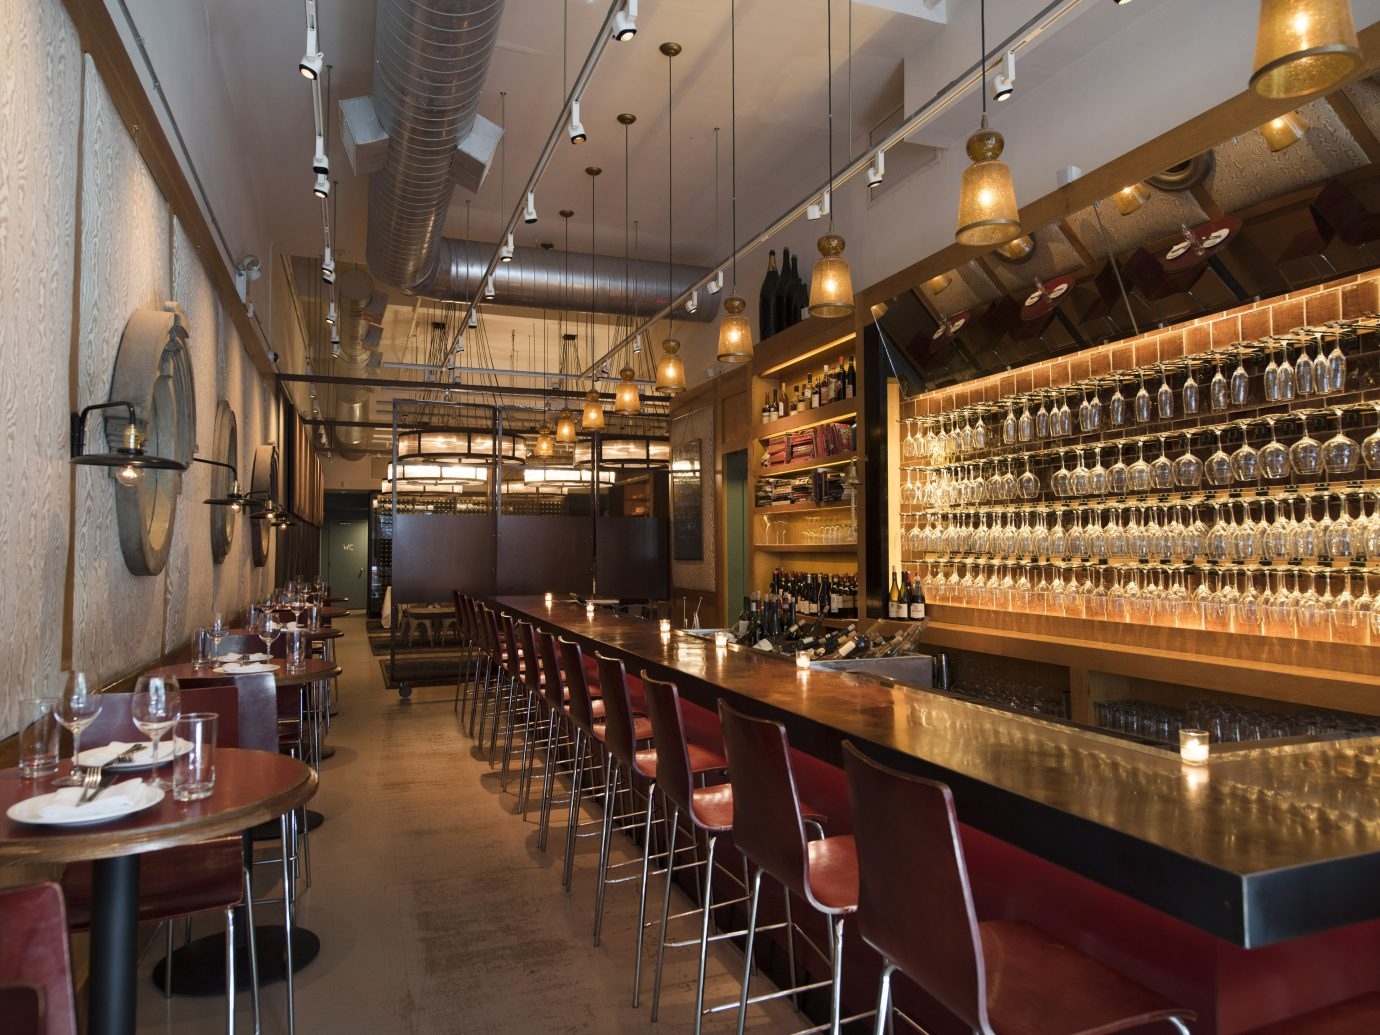 Wine bar at Corkbuzz in Union Square